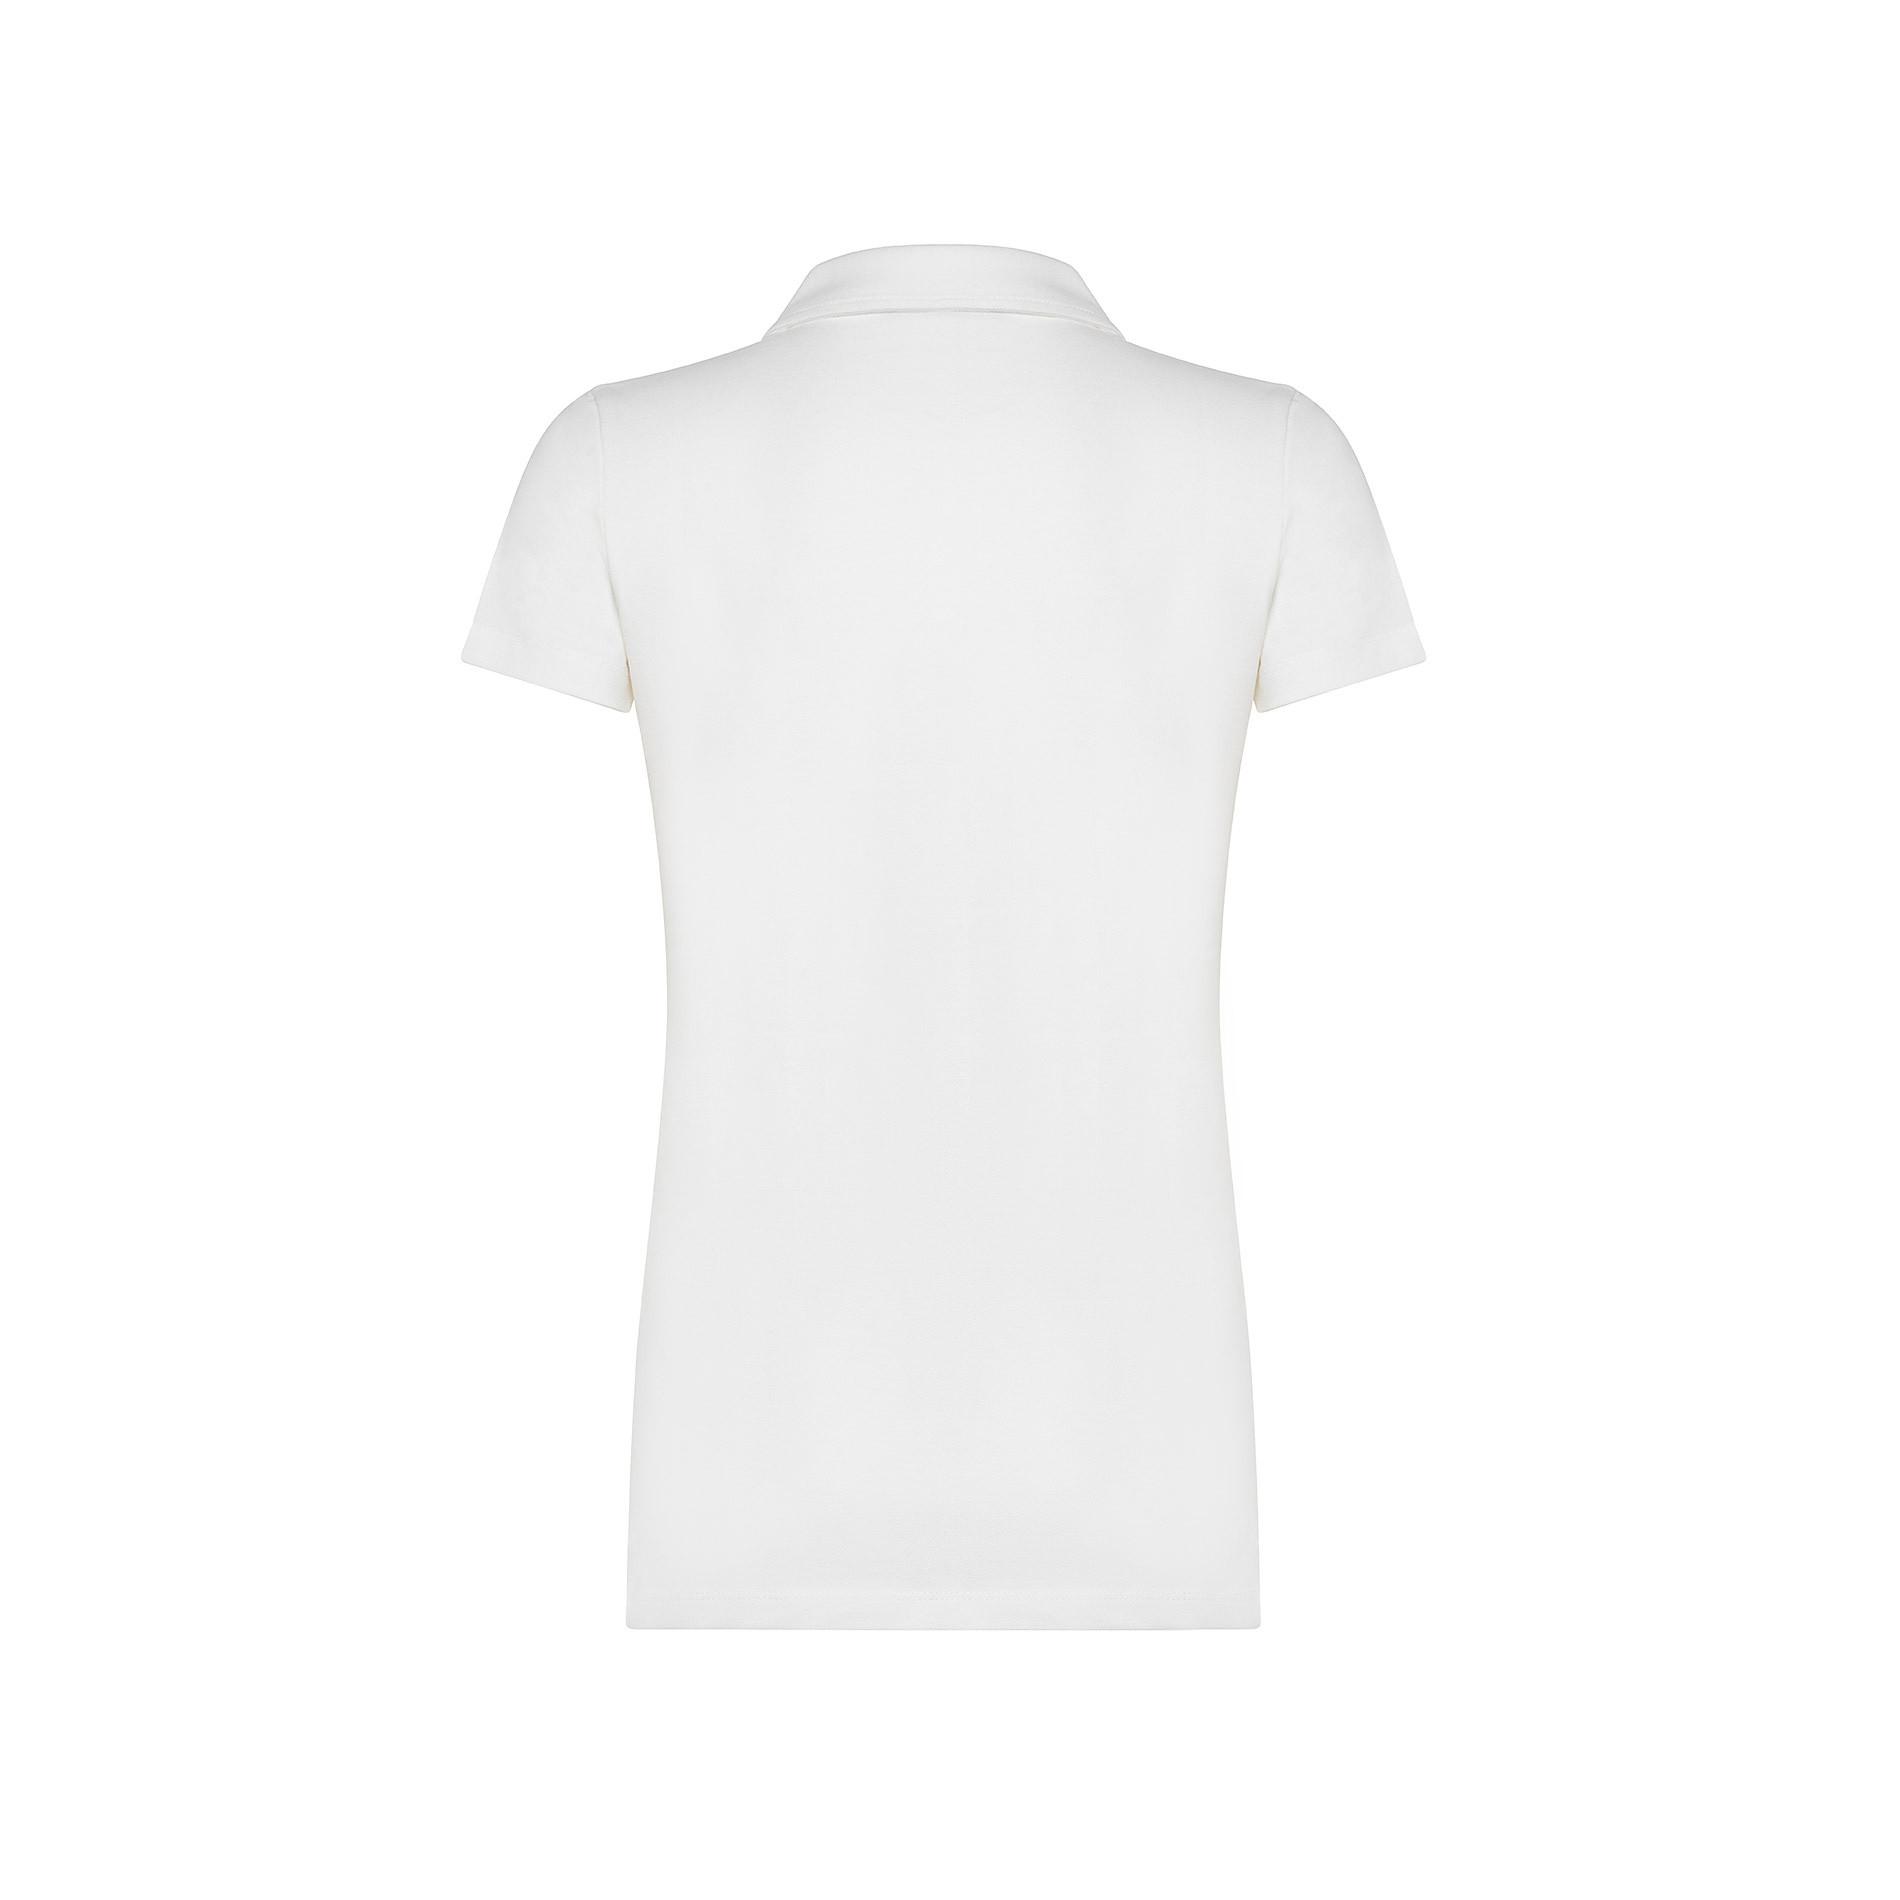 Polo cotone tinta unita, Bianco, large image number 1